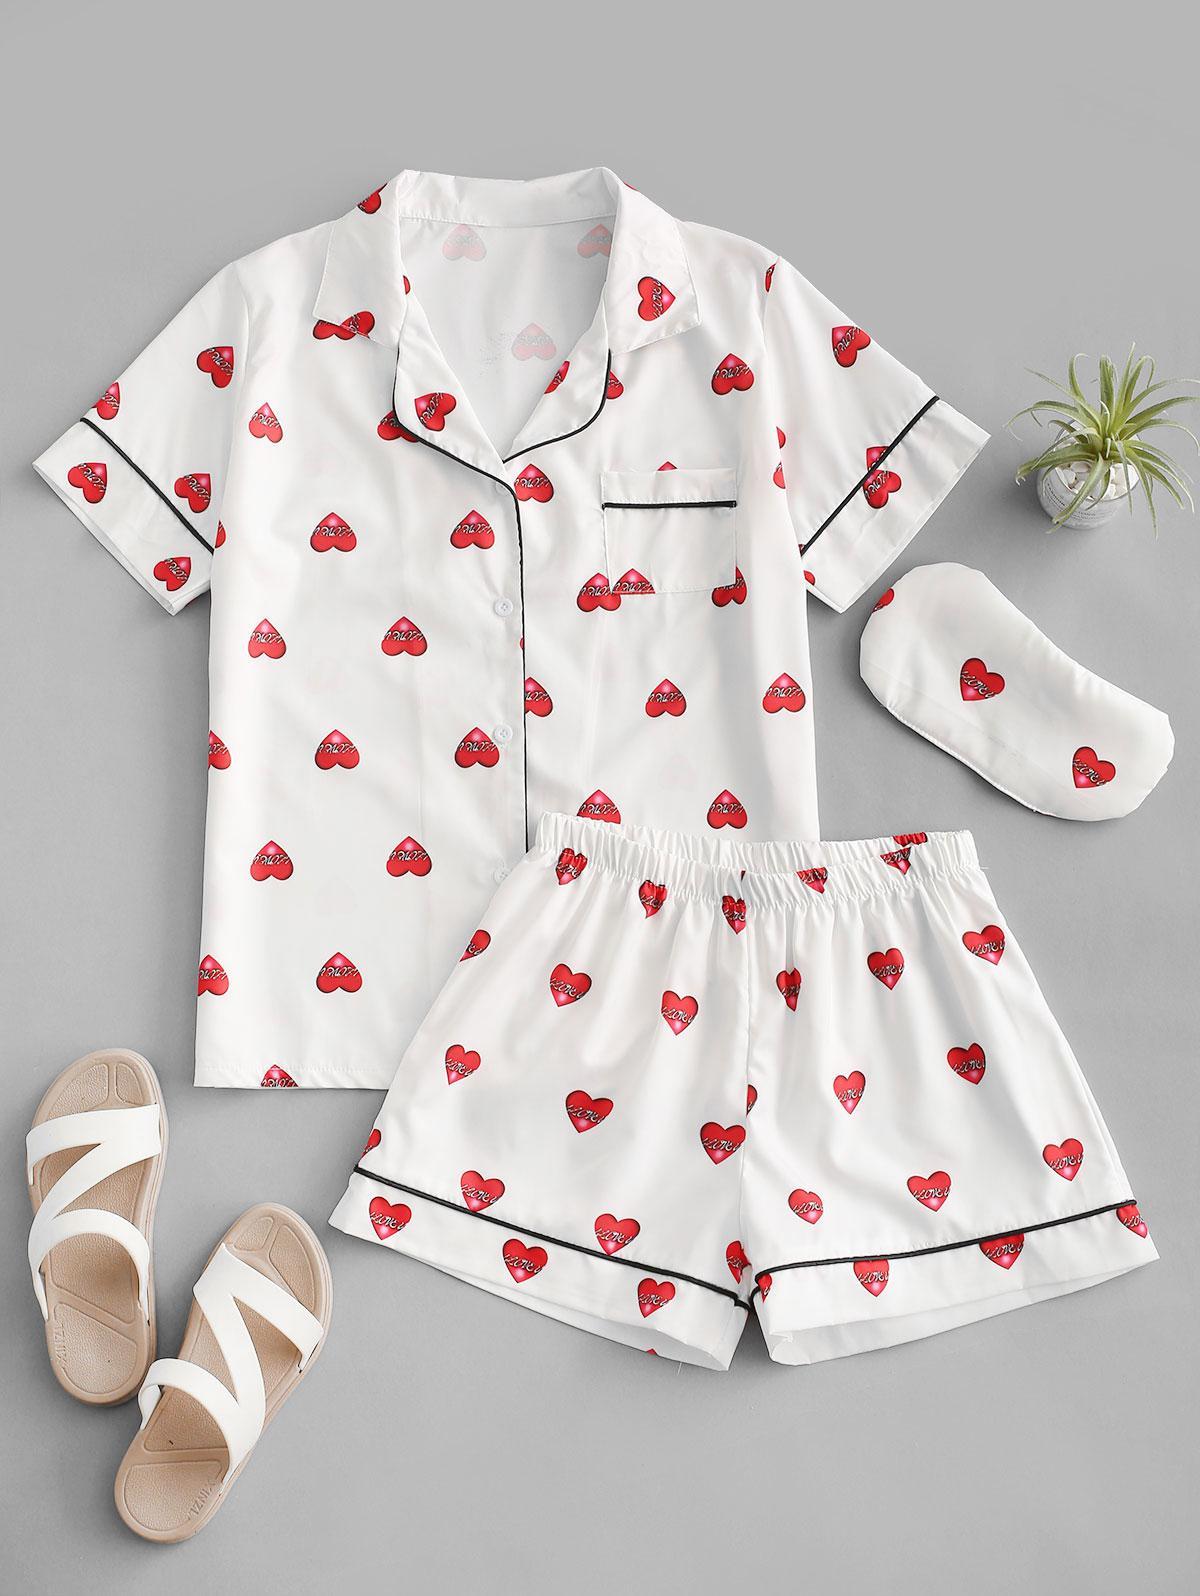 Hearts Print Binding Pocket Two Piece Pajamas Set